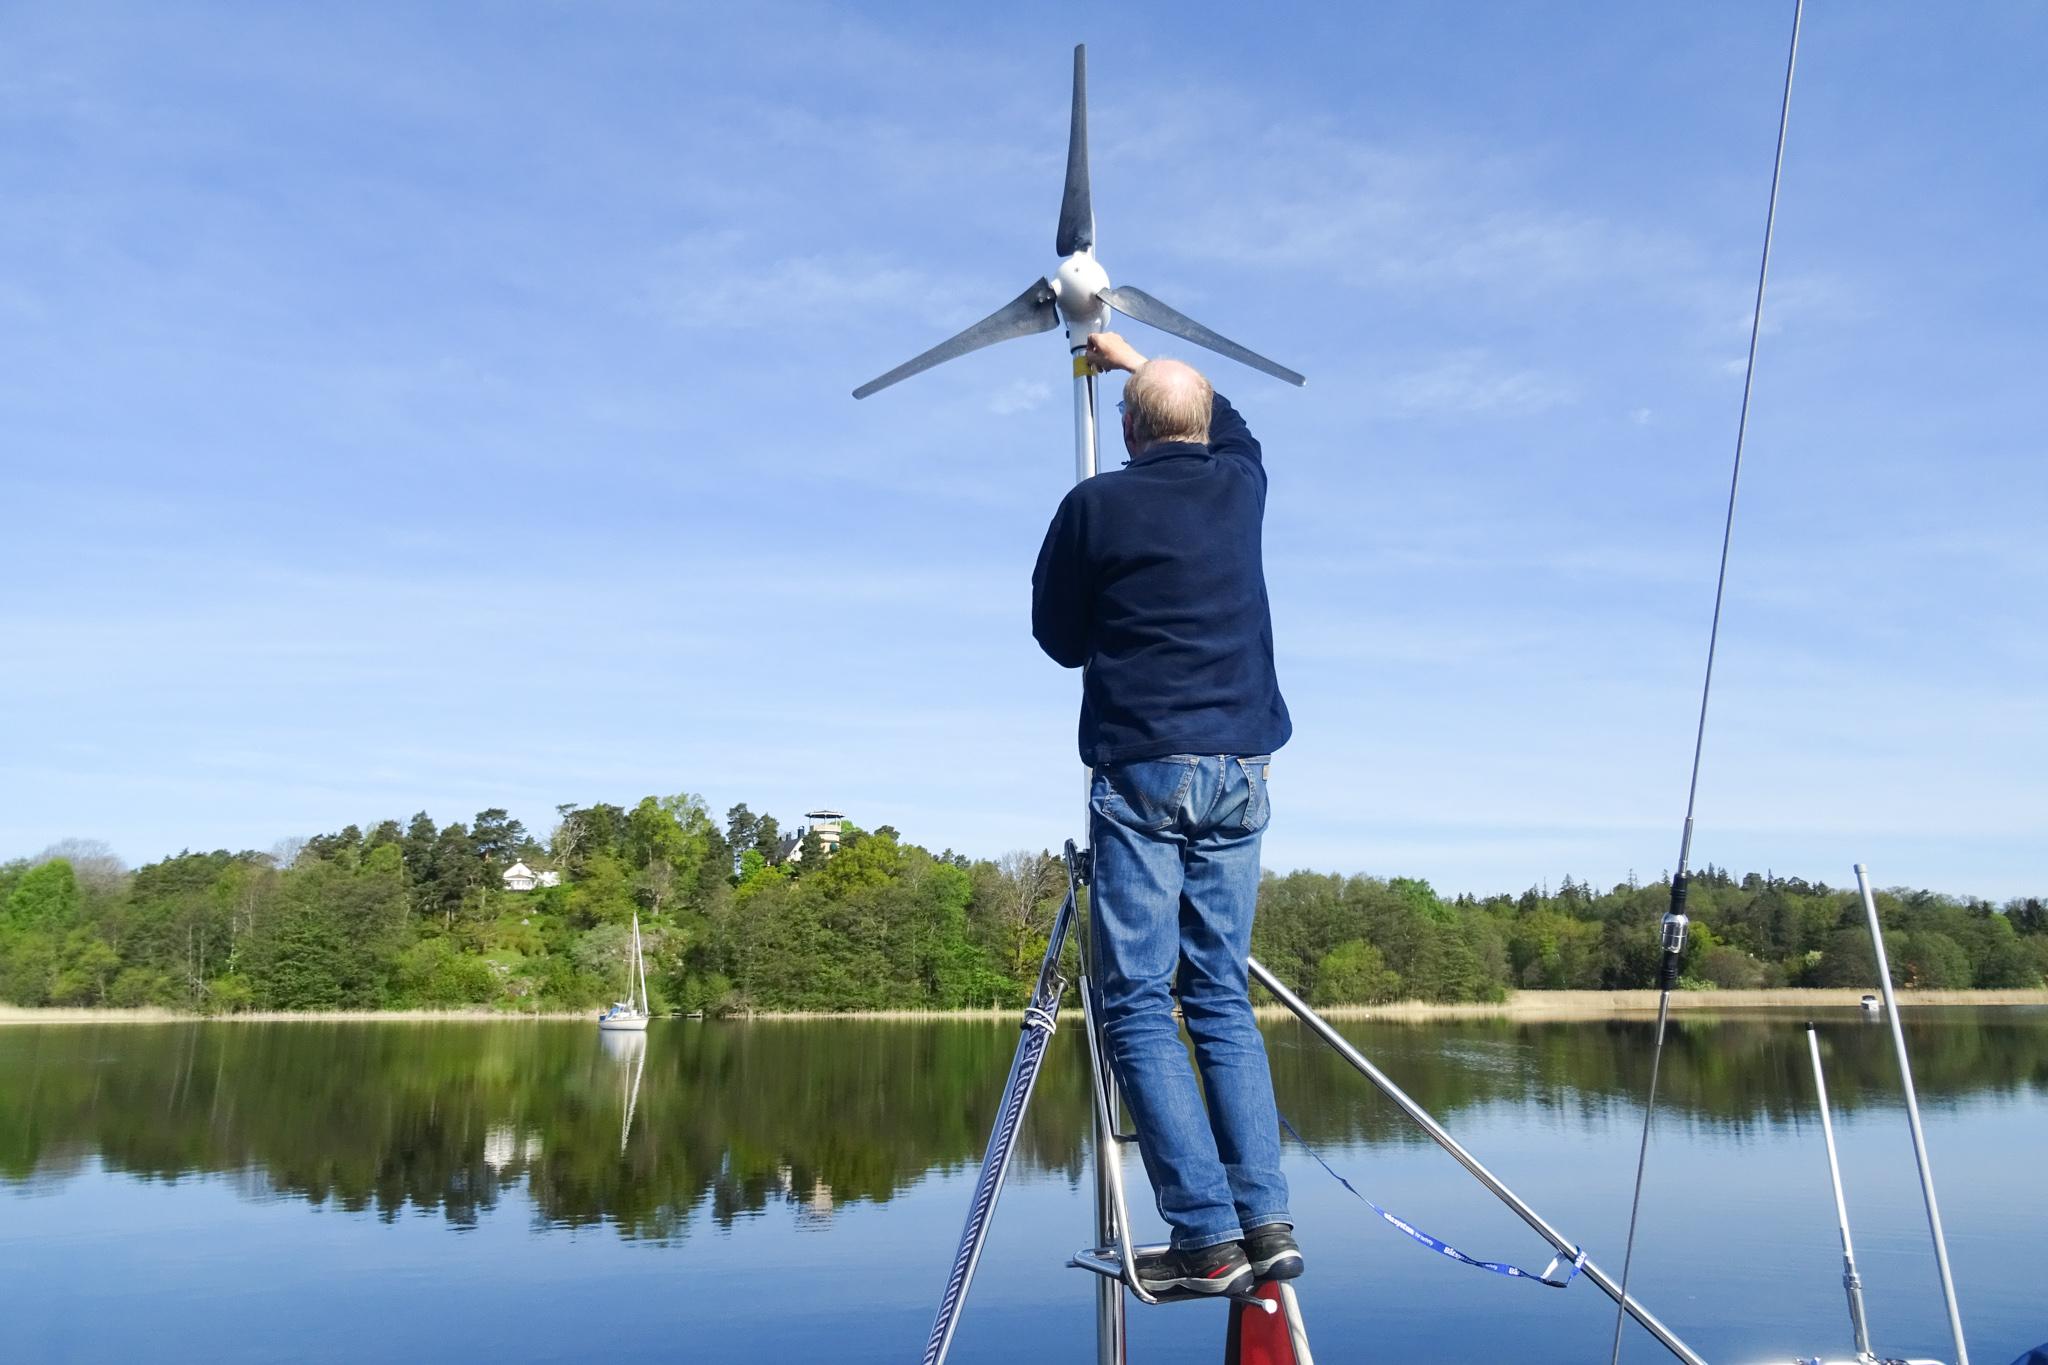 ... am Windgenerator